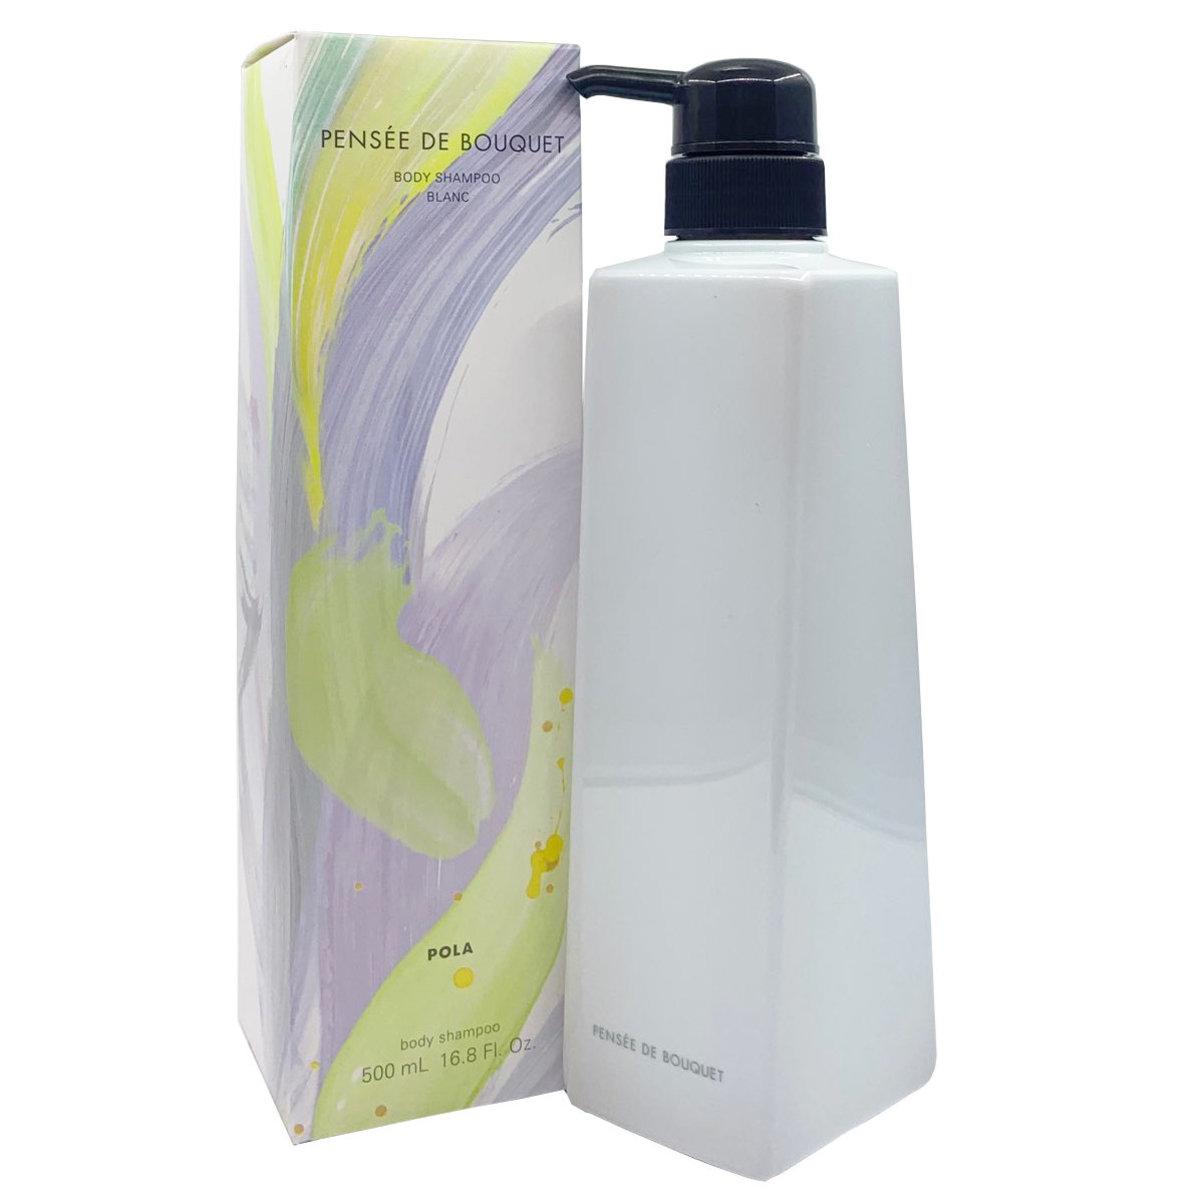 Pensee De Bouquet Body Shampoo Blanc 500ml [Parallel Import] (4953923307298)